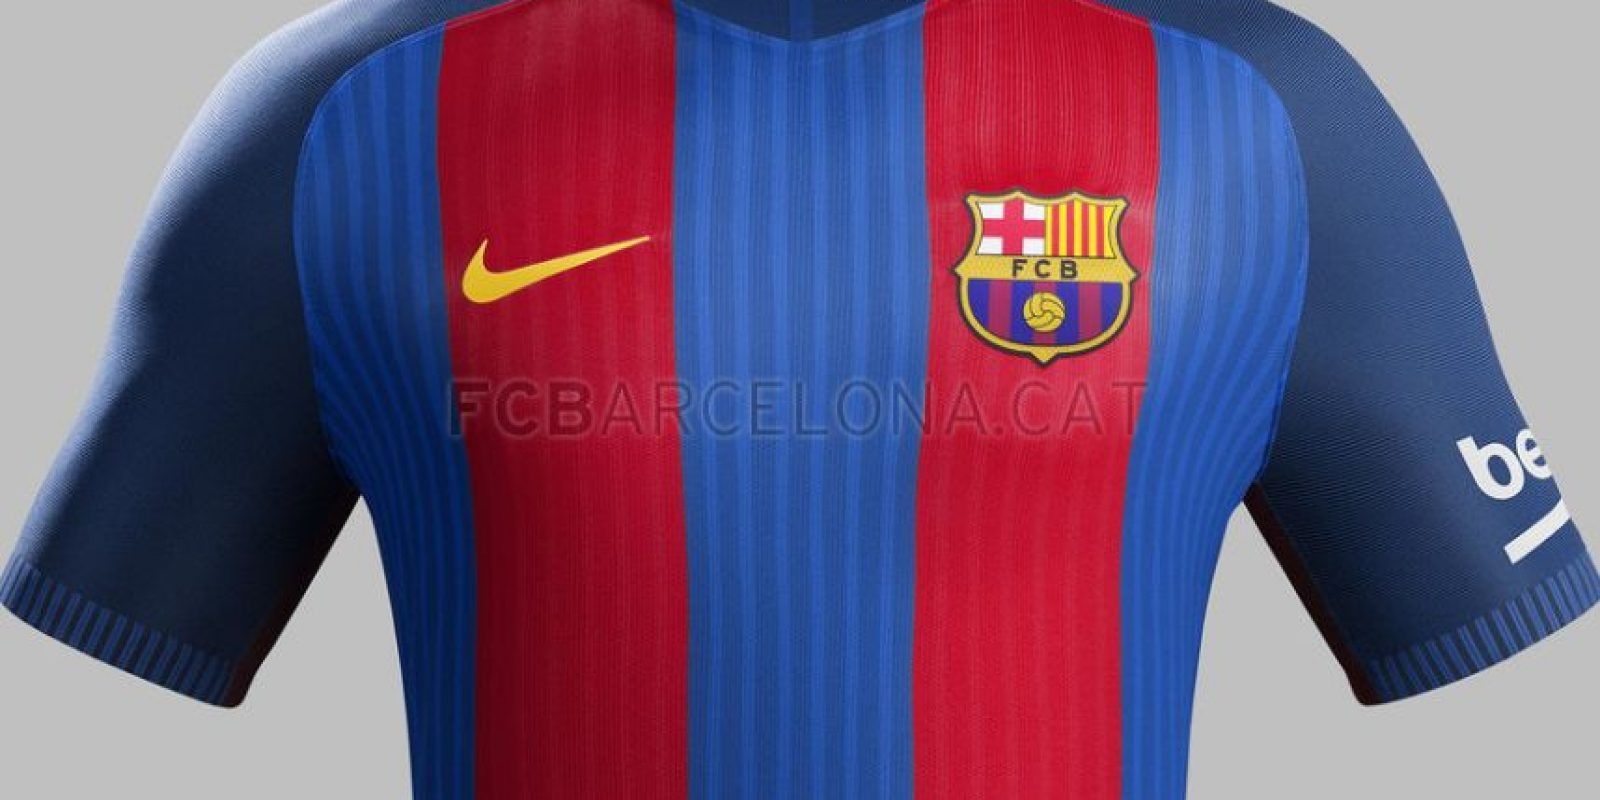 Foto:fcbarcelona.com